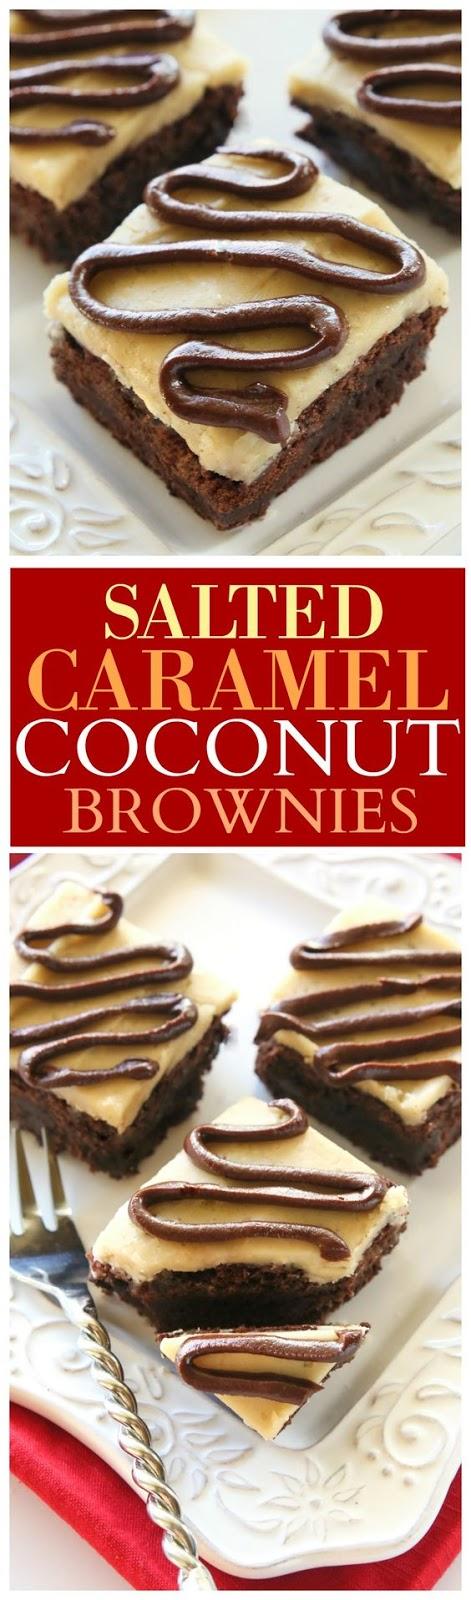 Salted Caramel Coconut Brownies